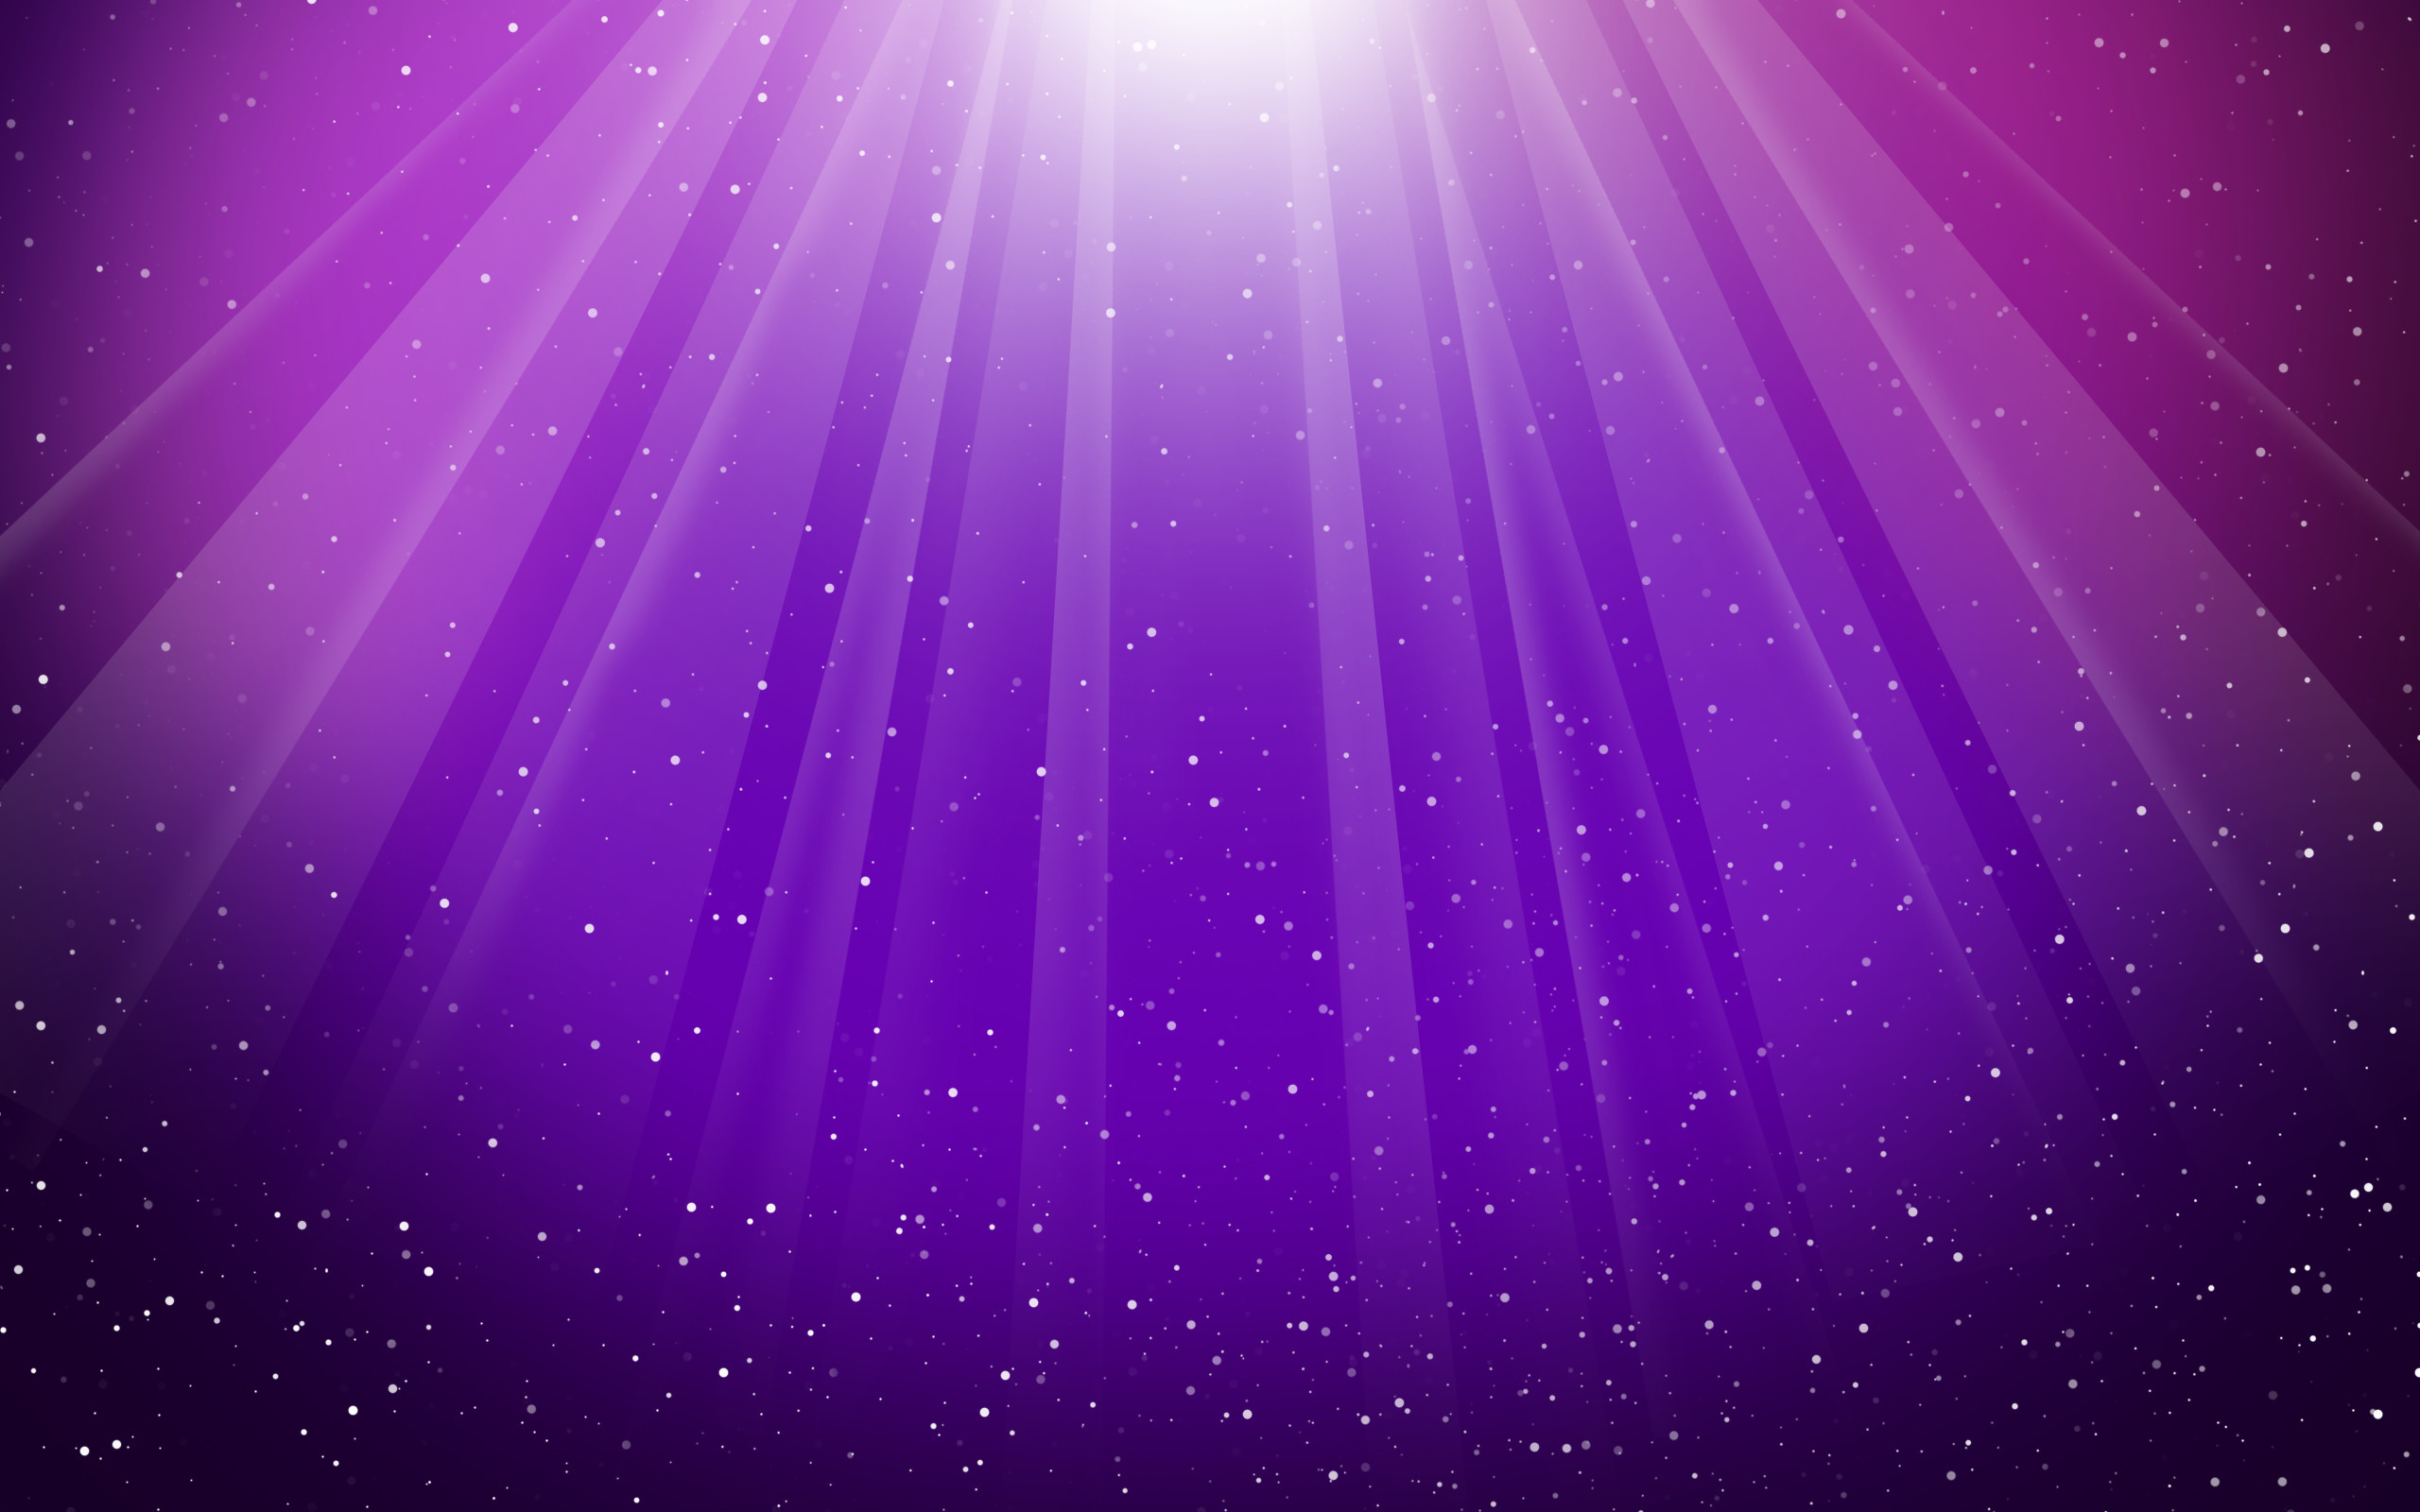 Amazing Purple Backgrounds